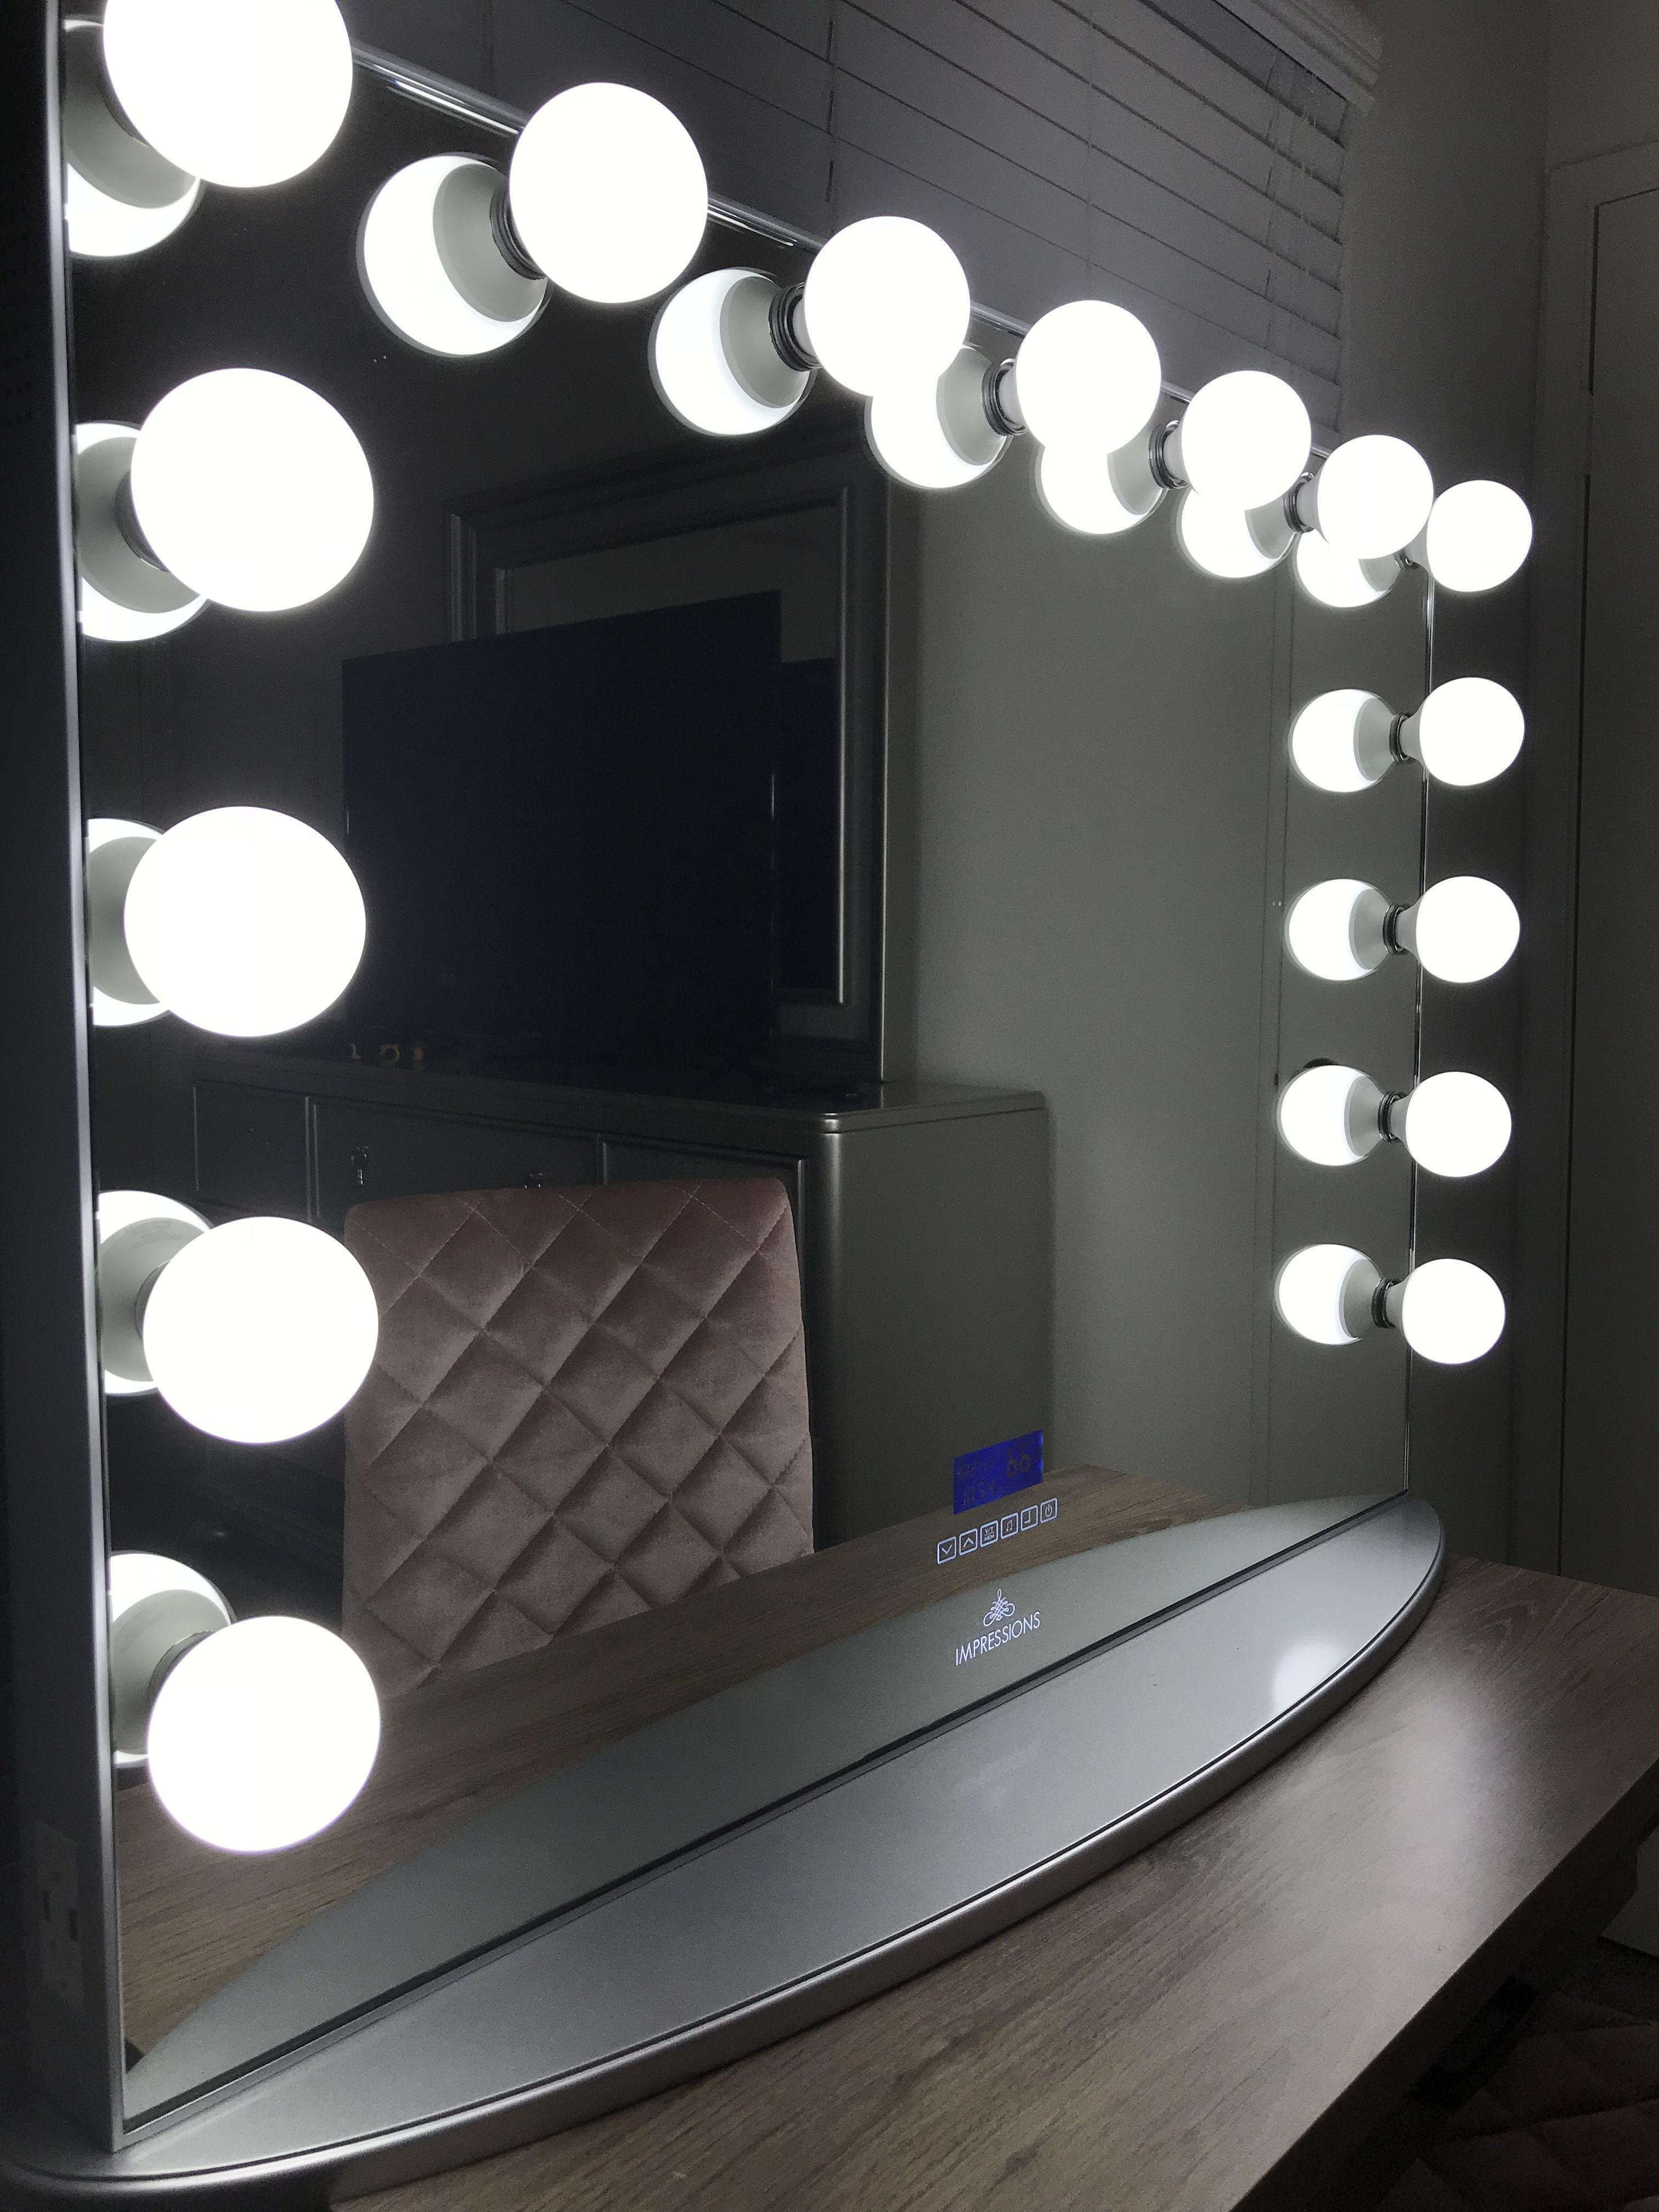 Impressions vanity mirror bluetooth Impressions vanity